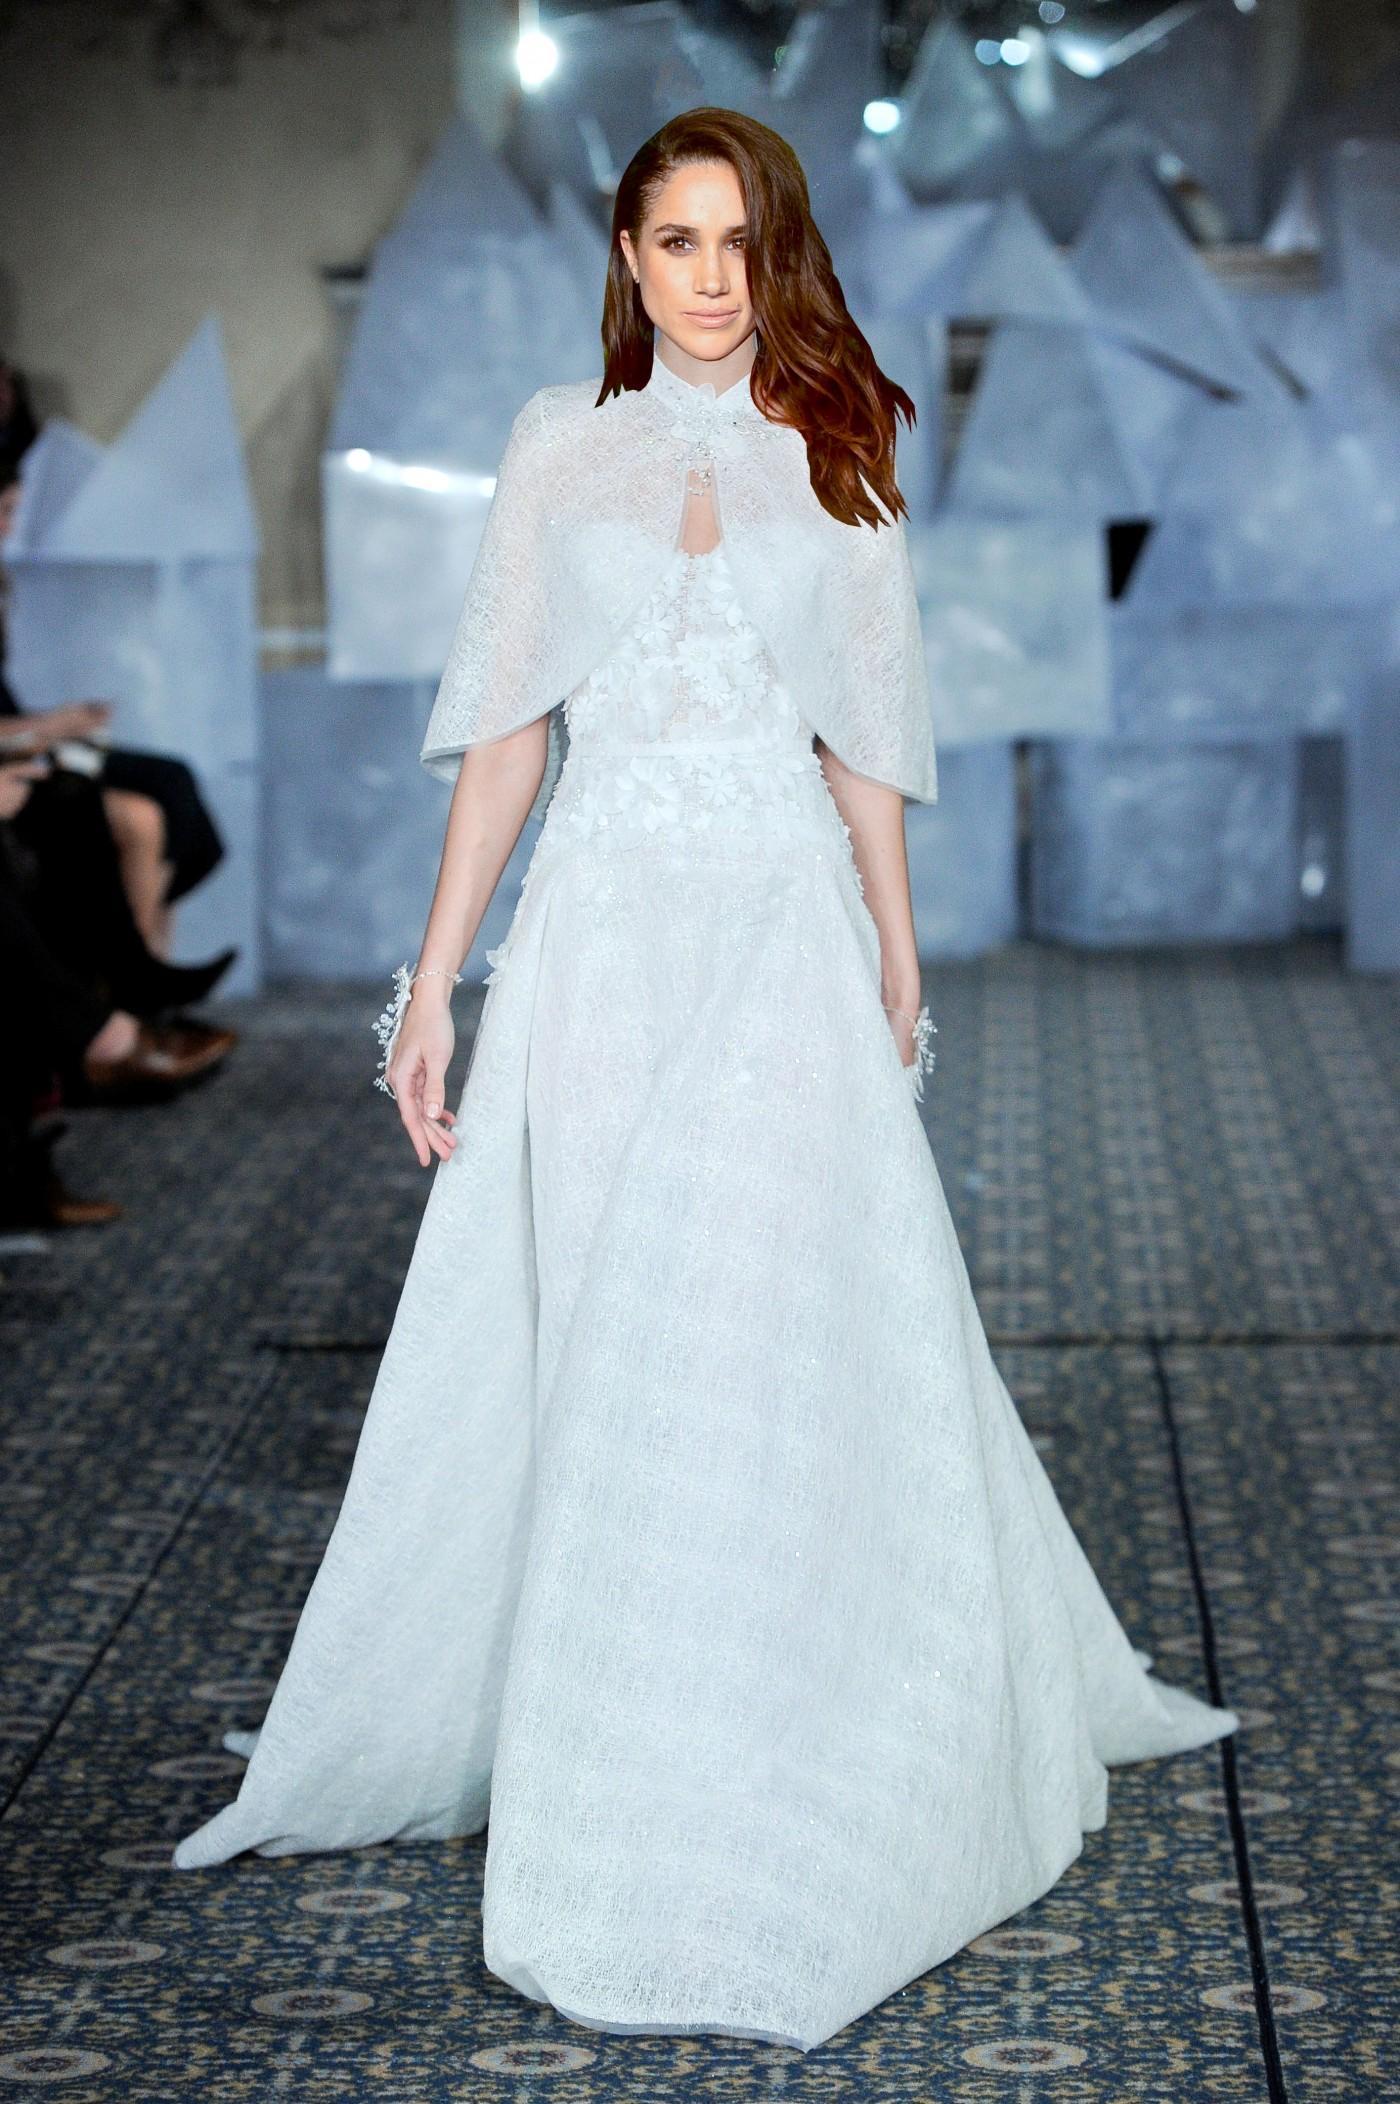 Model Gaun Kebaya Modern Warna Putih